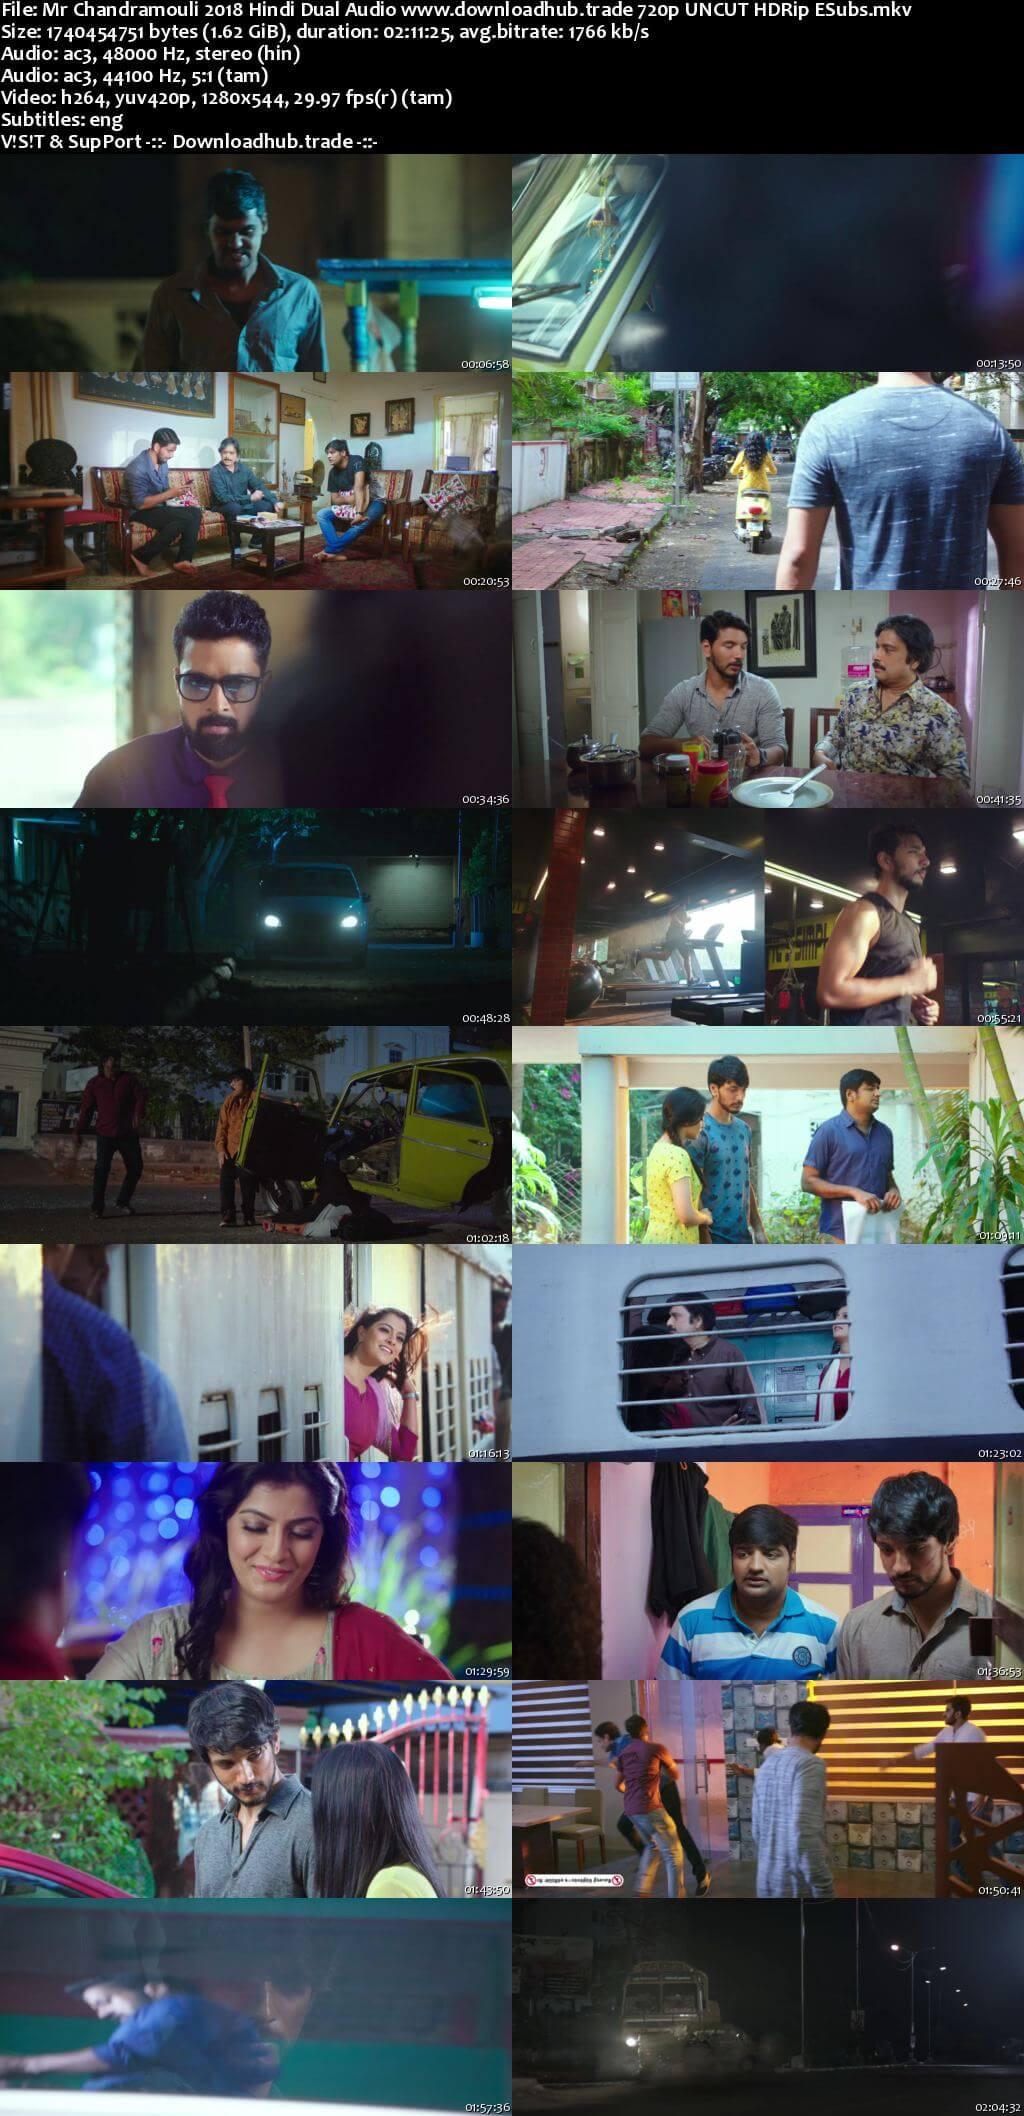 Mr Chandramouli 2018 Hindi Dual Audio 720p UNCUT HDRip ESubs